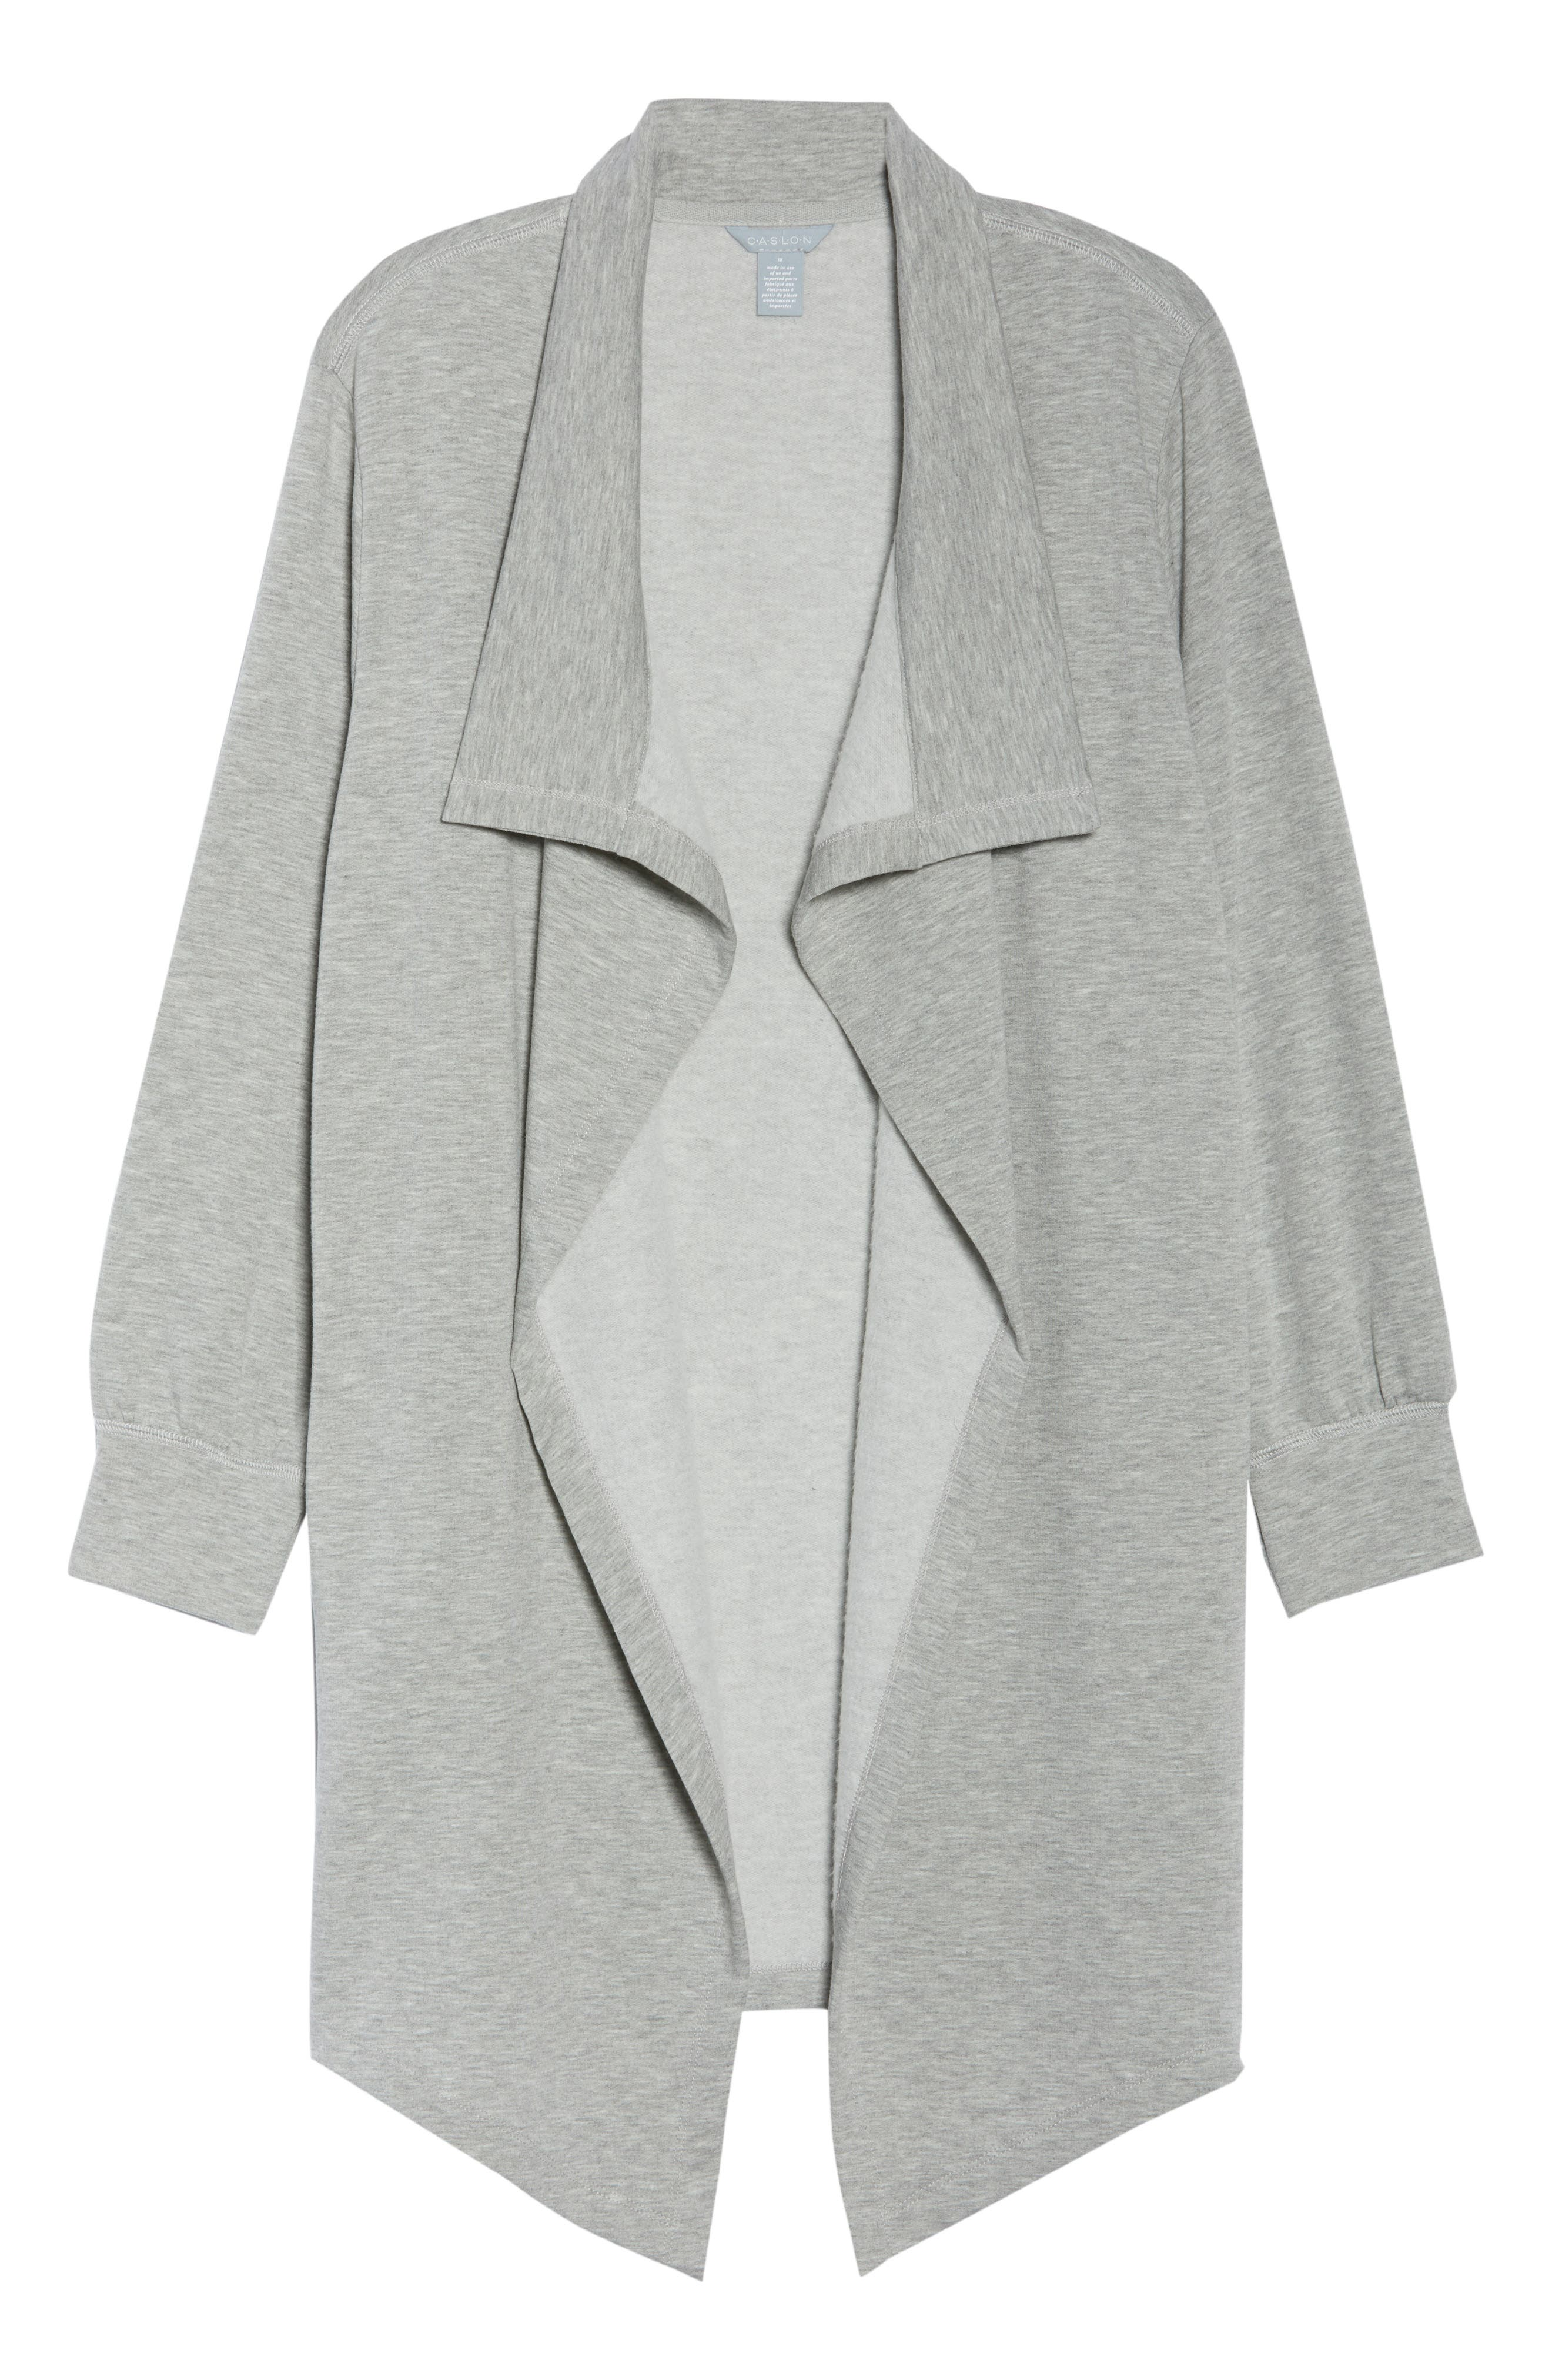 Off-Duty Fleece Knit Cardigan,                         Main,                         color, Grey Heather